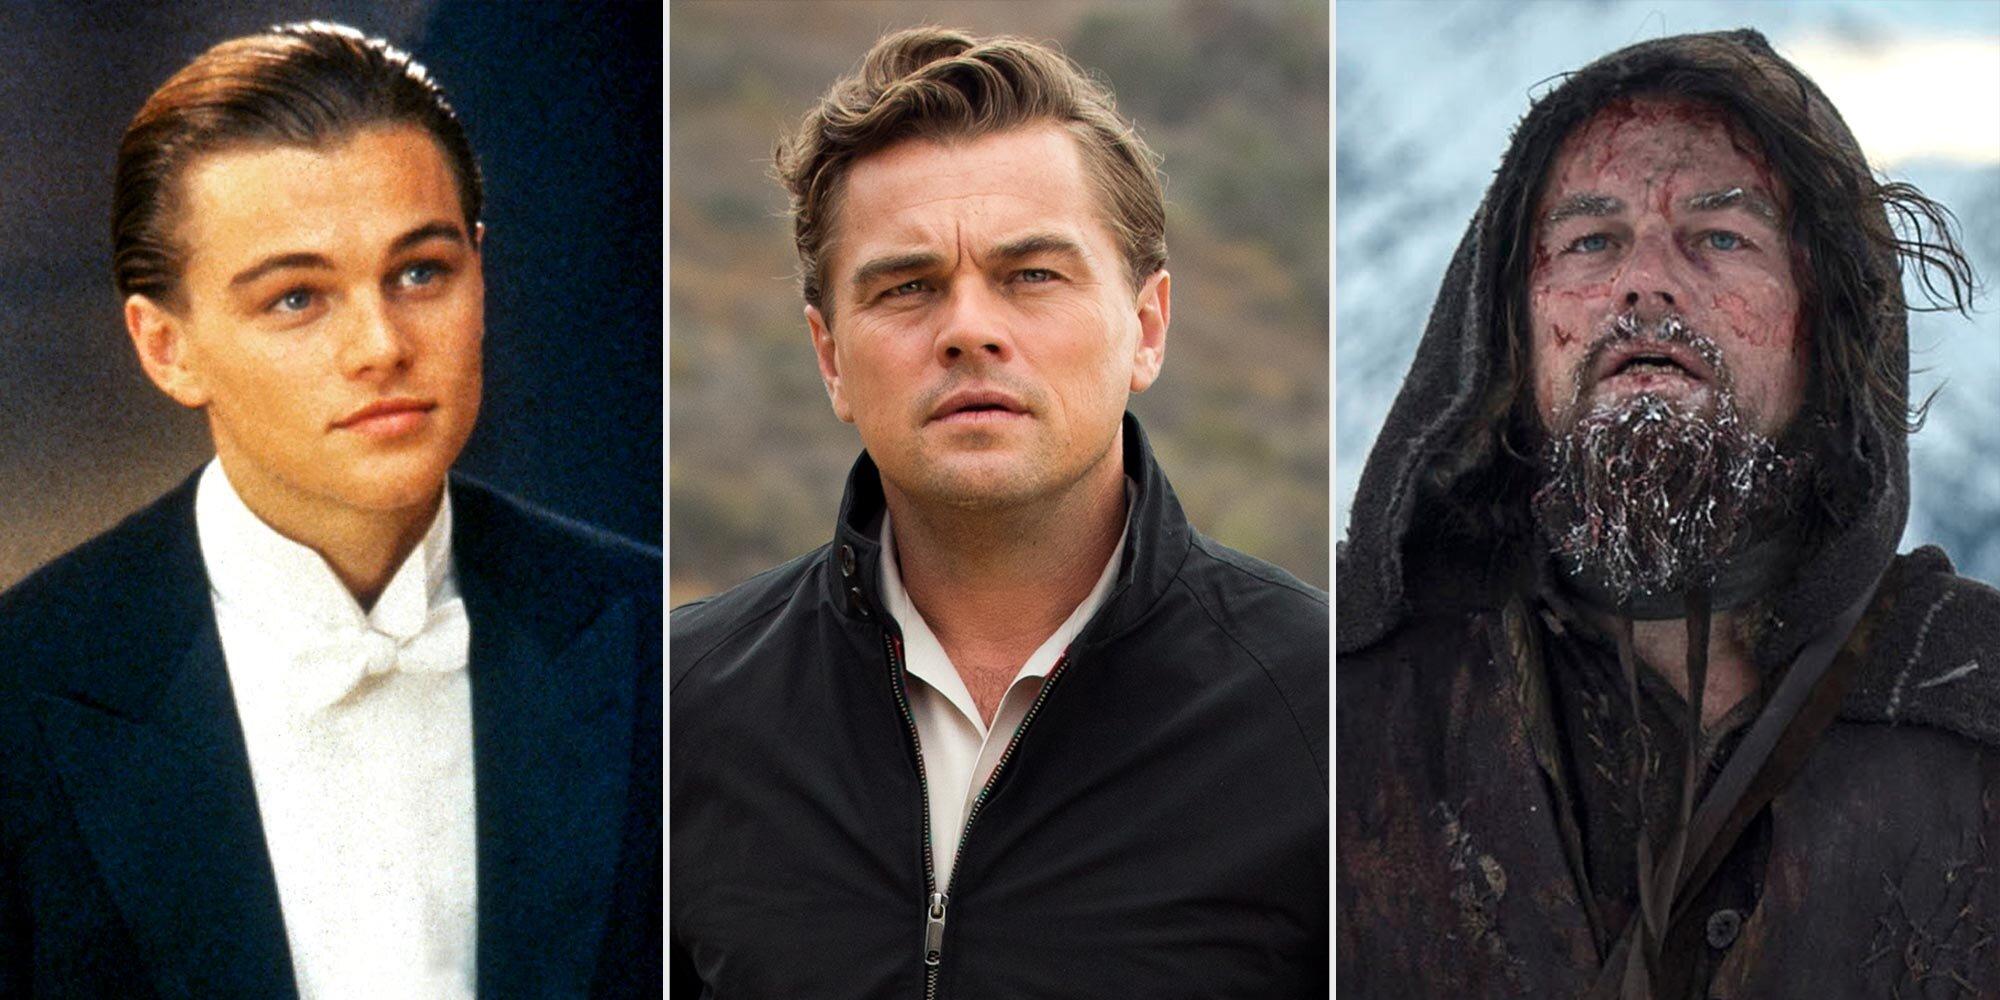 Every Leonardo DiCaprio film performance, ranked